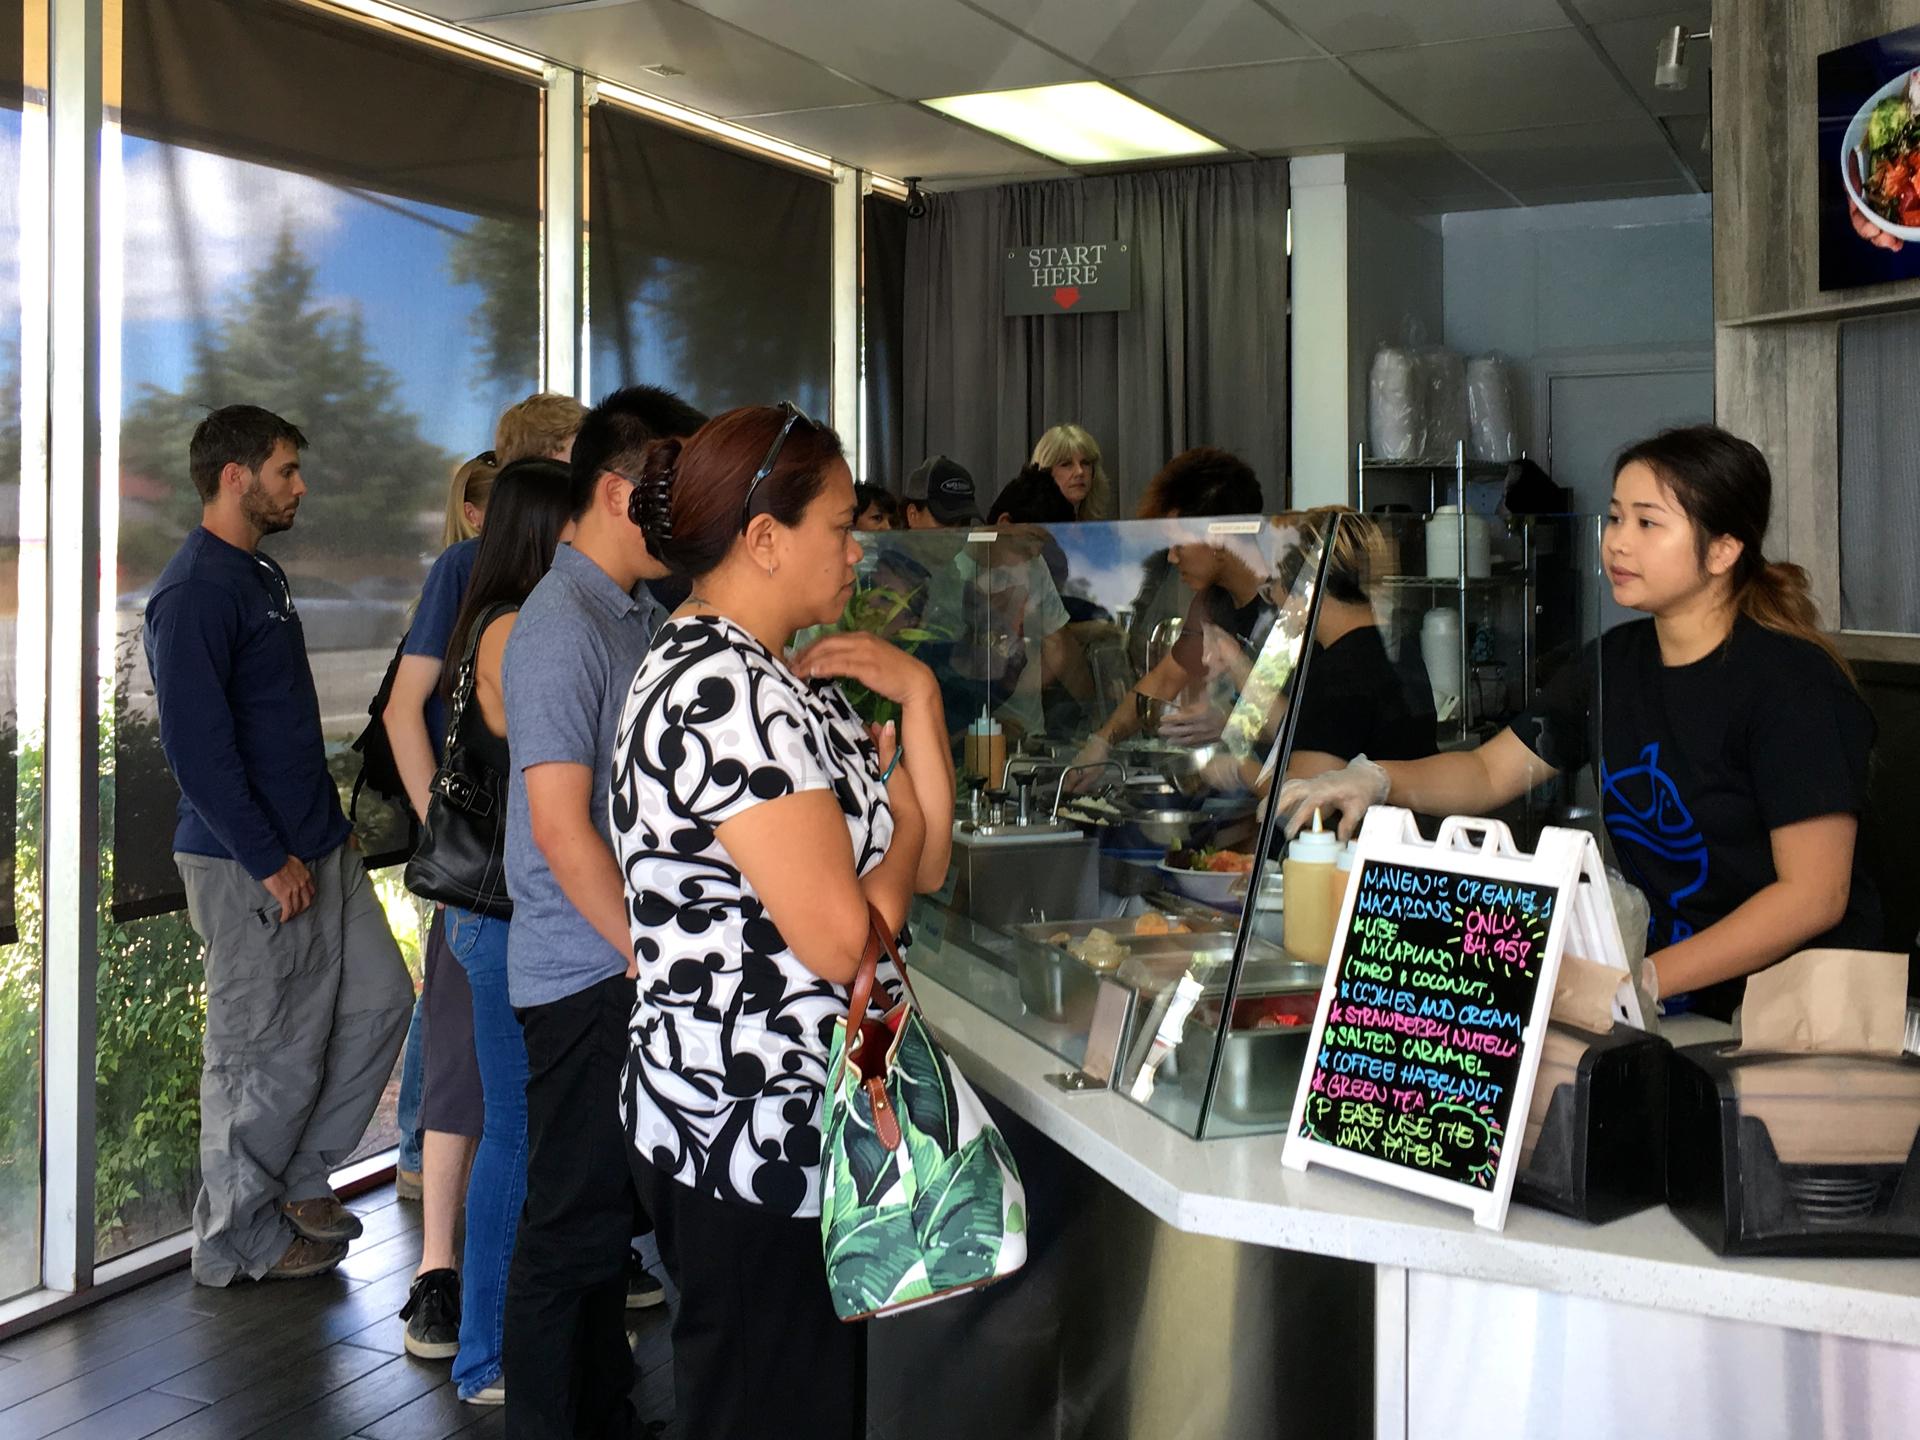 Customers in line at Poki Bowl in San Jose.